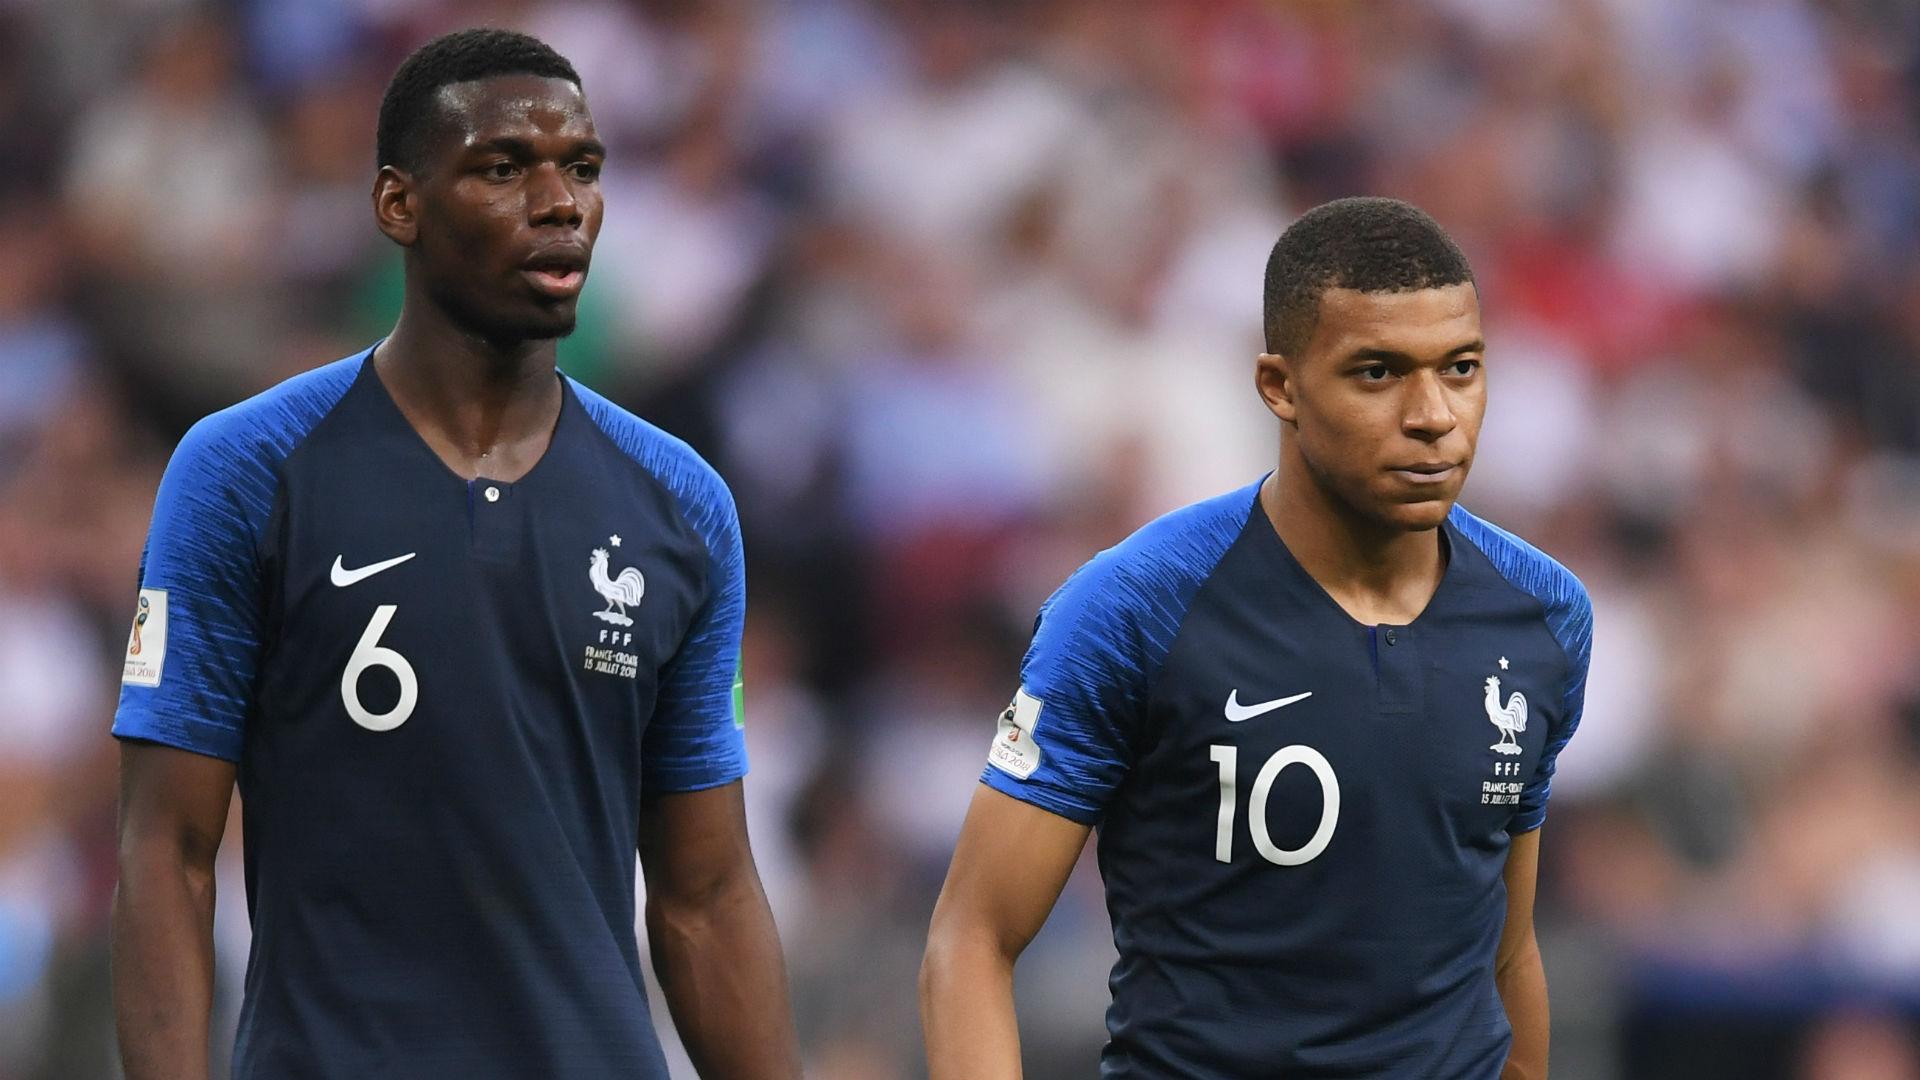 aul Pogba Kylian Mbappe France World Cup 2018